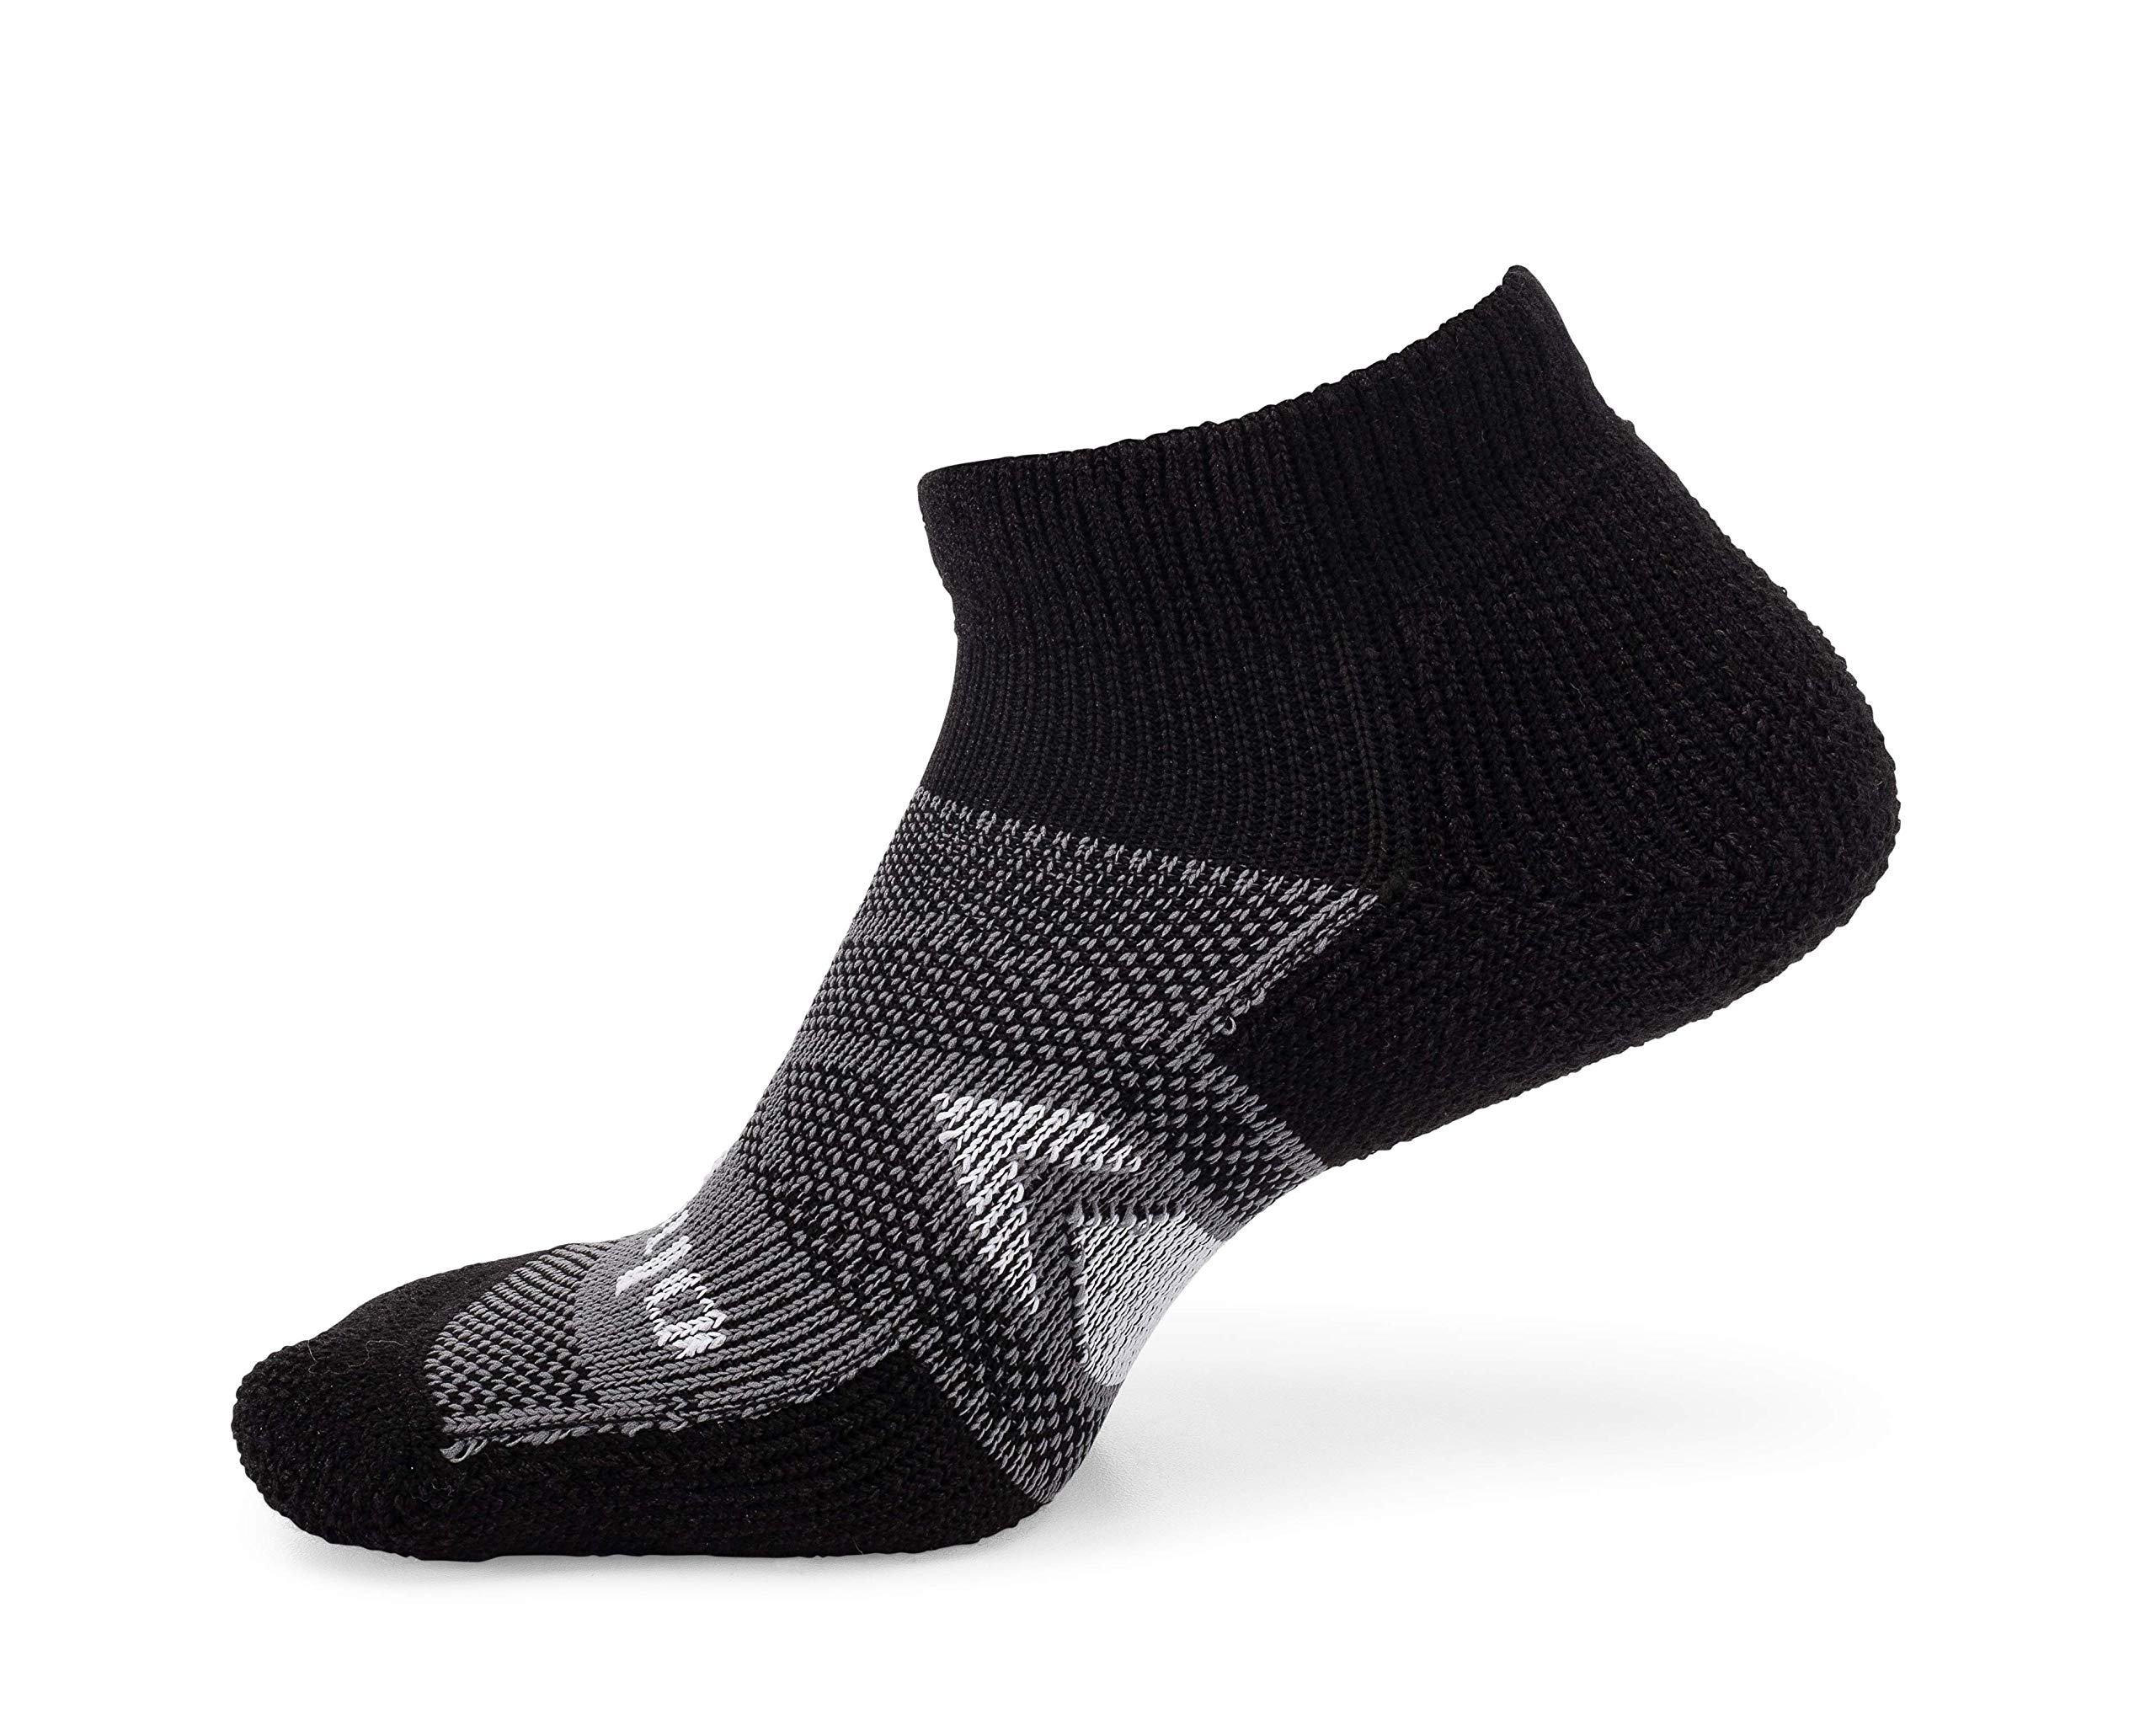 Thorlos Experia Unisex XCMU Multi-Sport Thin Padded Ankle Sock